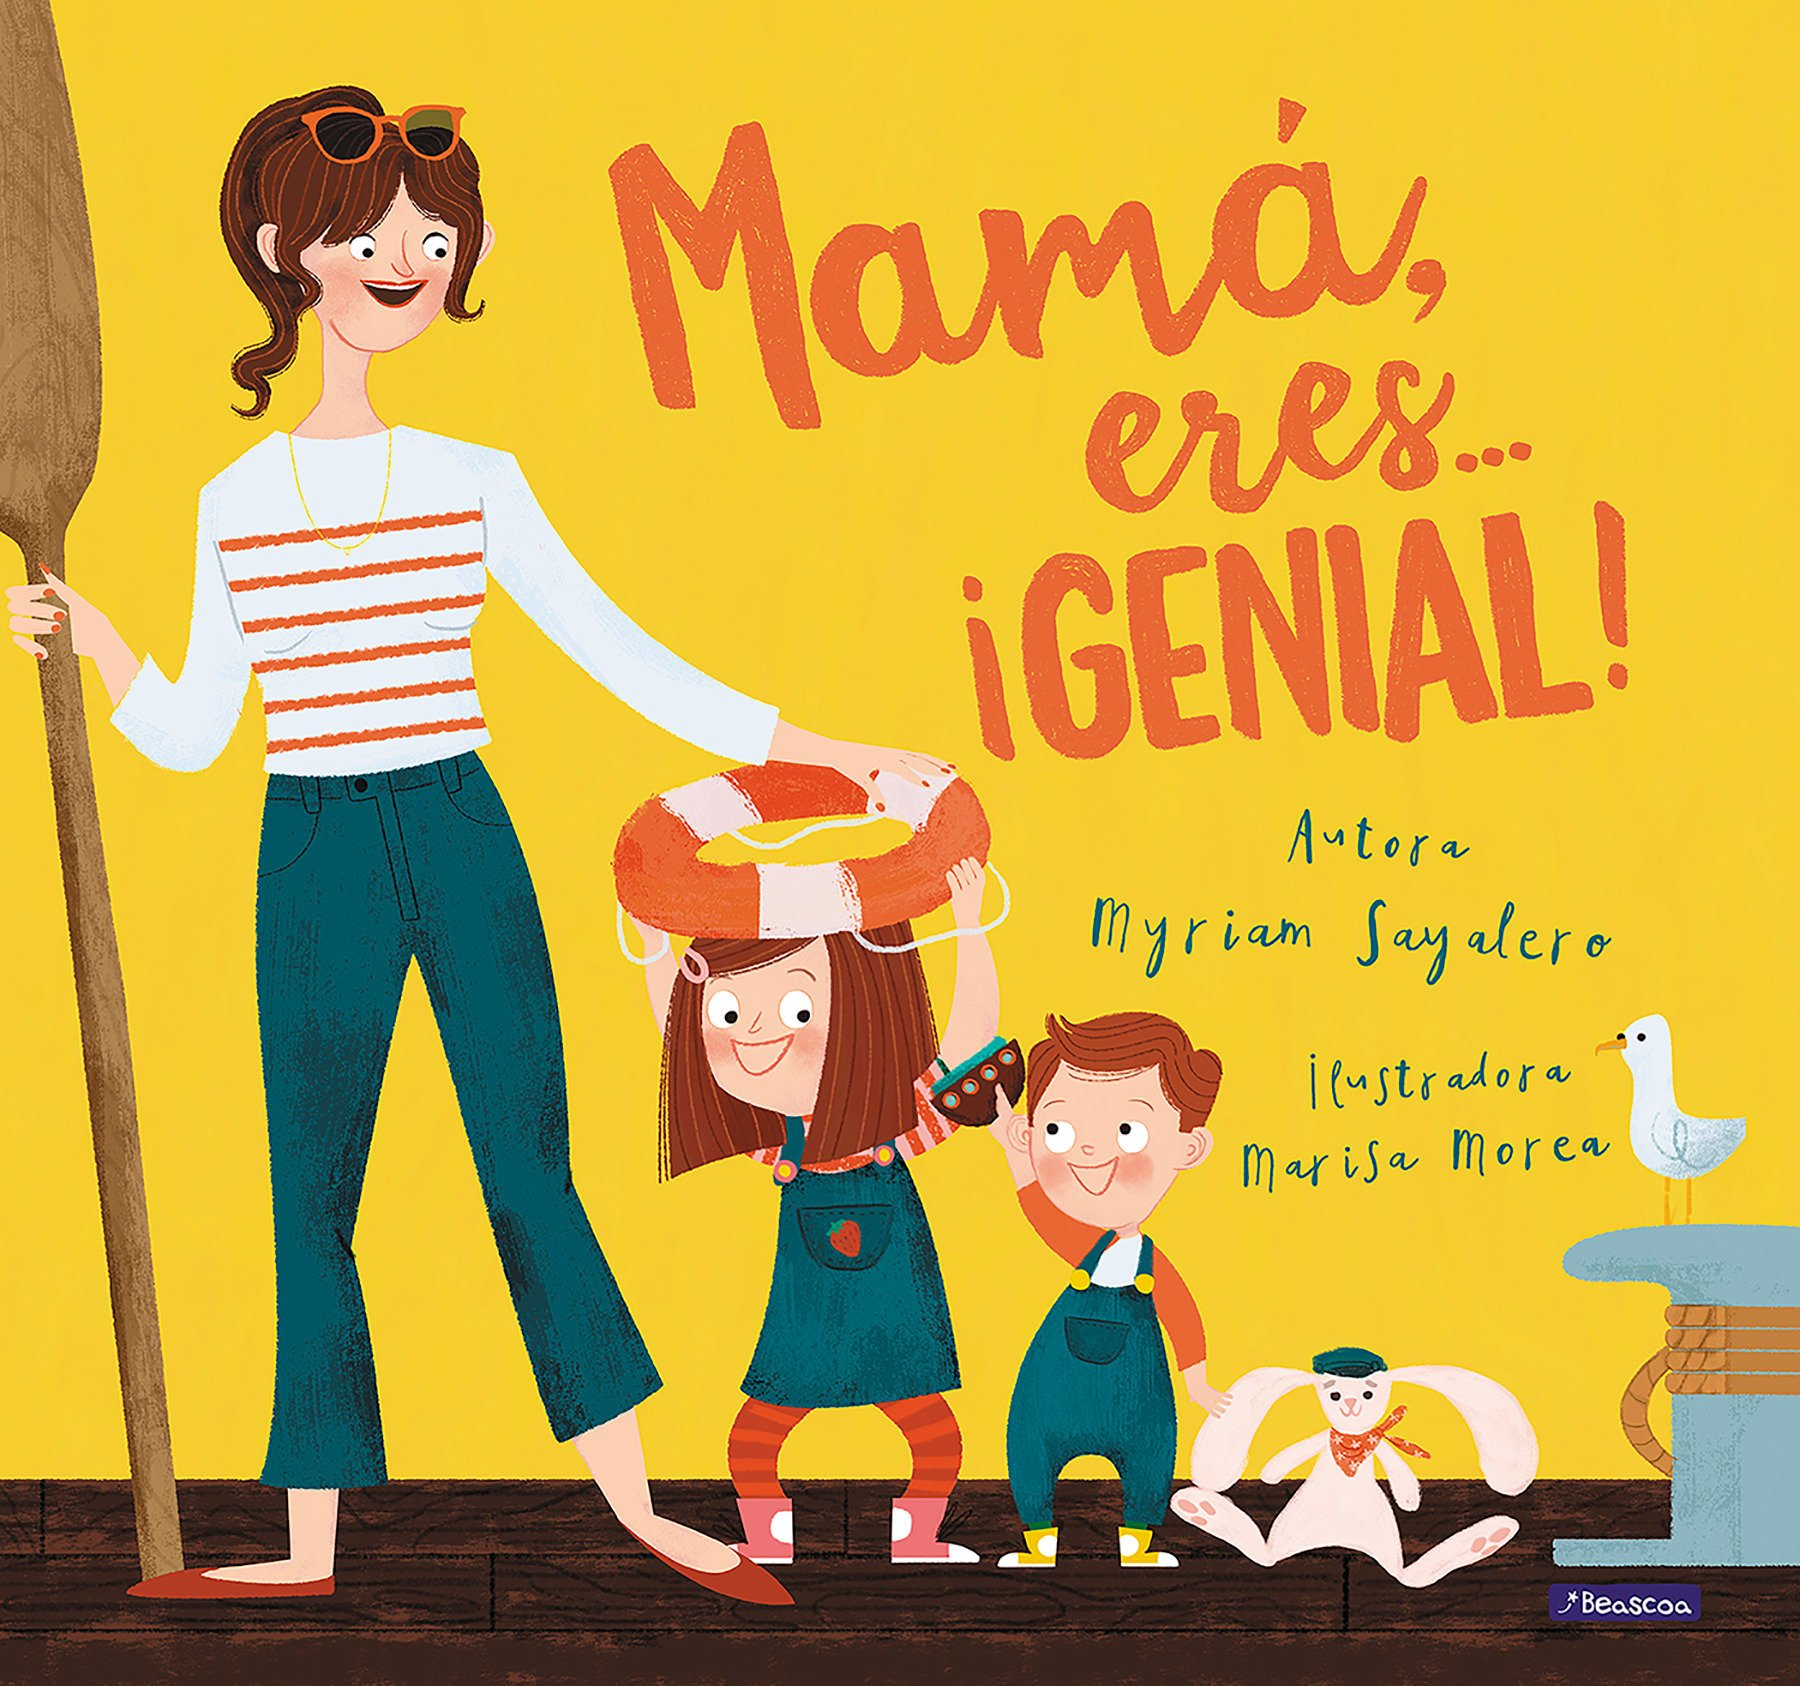 Mamá, eres ¡genial! / Mom, You Are Awesome! (Spanish Edition): Myriam  Sayalero: 9788448847821: Amazon.com: Books